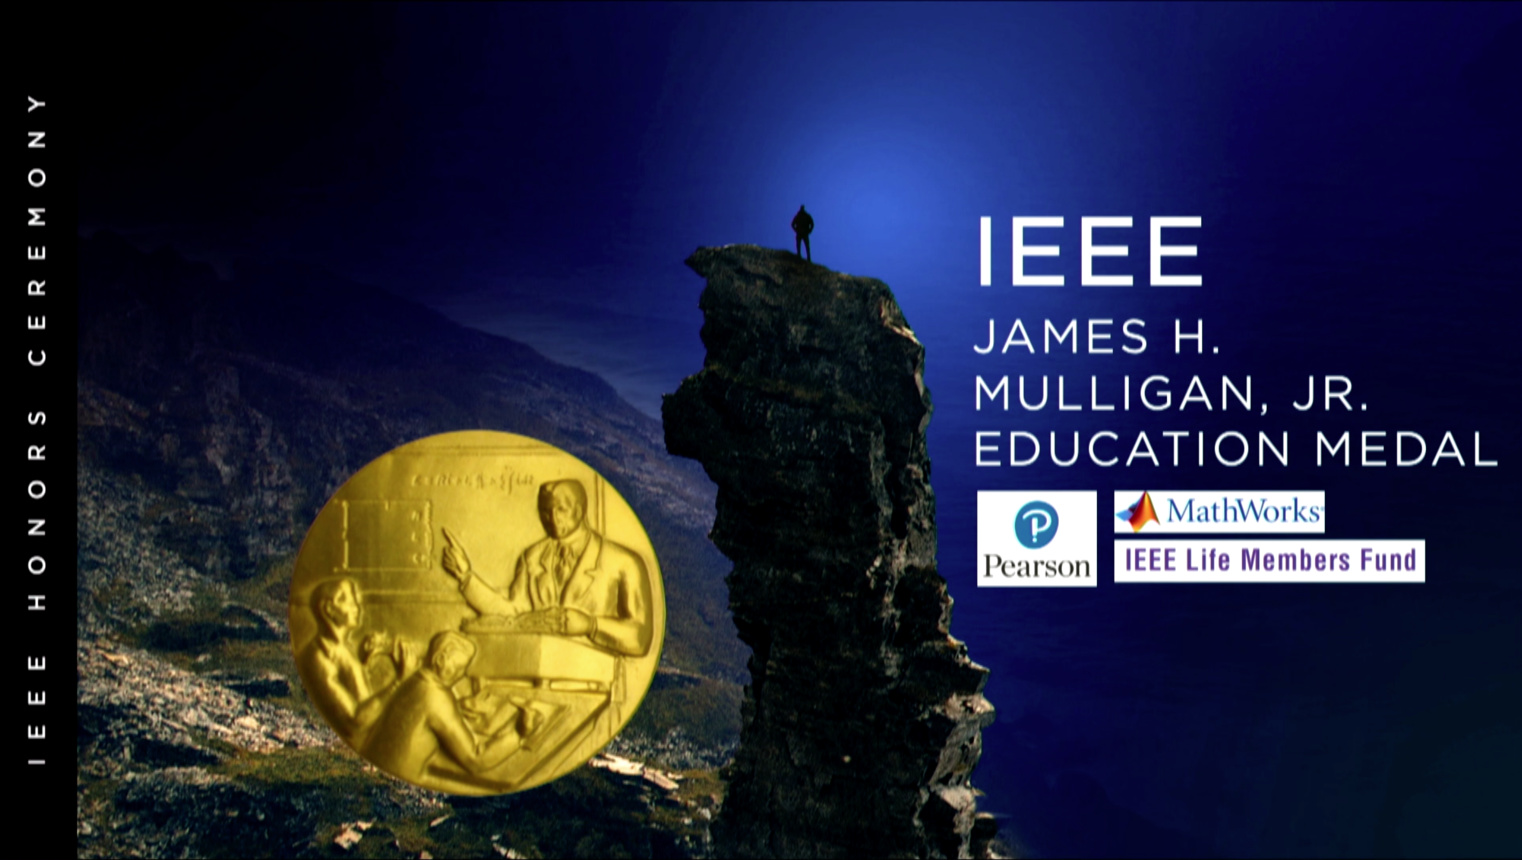 IEEE James H. Mulligan Jr Education Medal - Delores M. Etter - 2018 IEEE Honors Ceremony